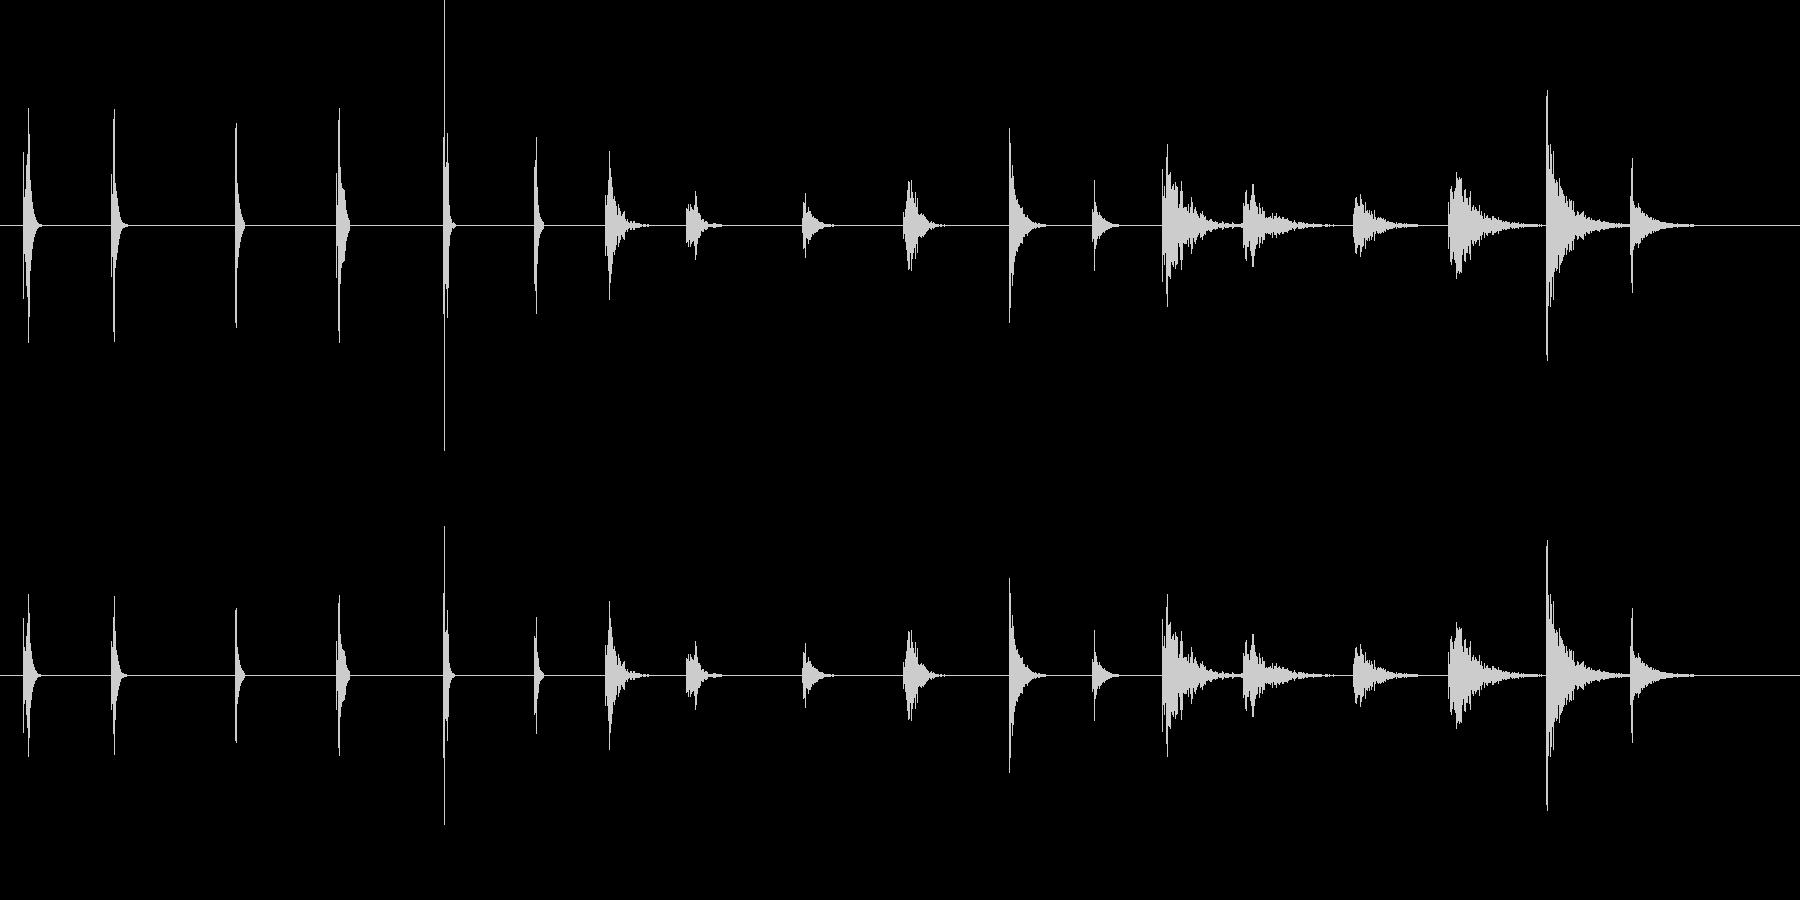 PEEPS&BEEPS、6バージョ...の未再生の波形